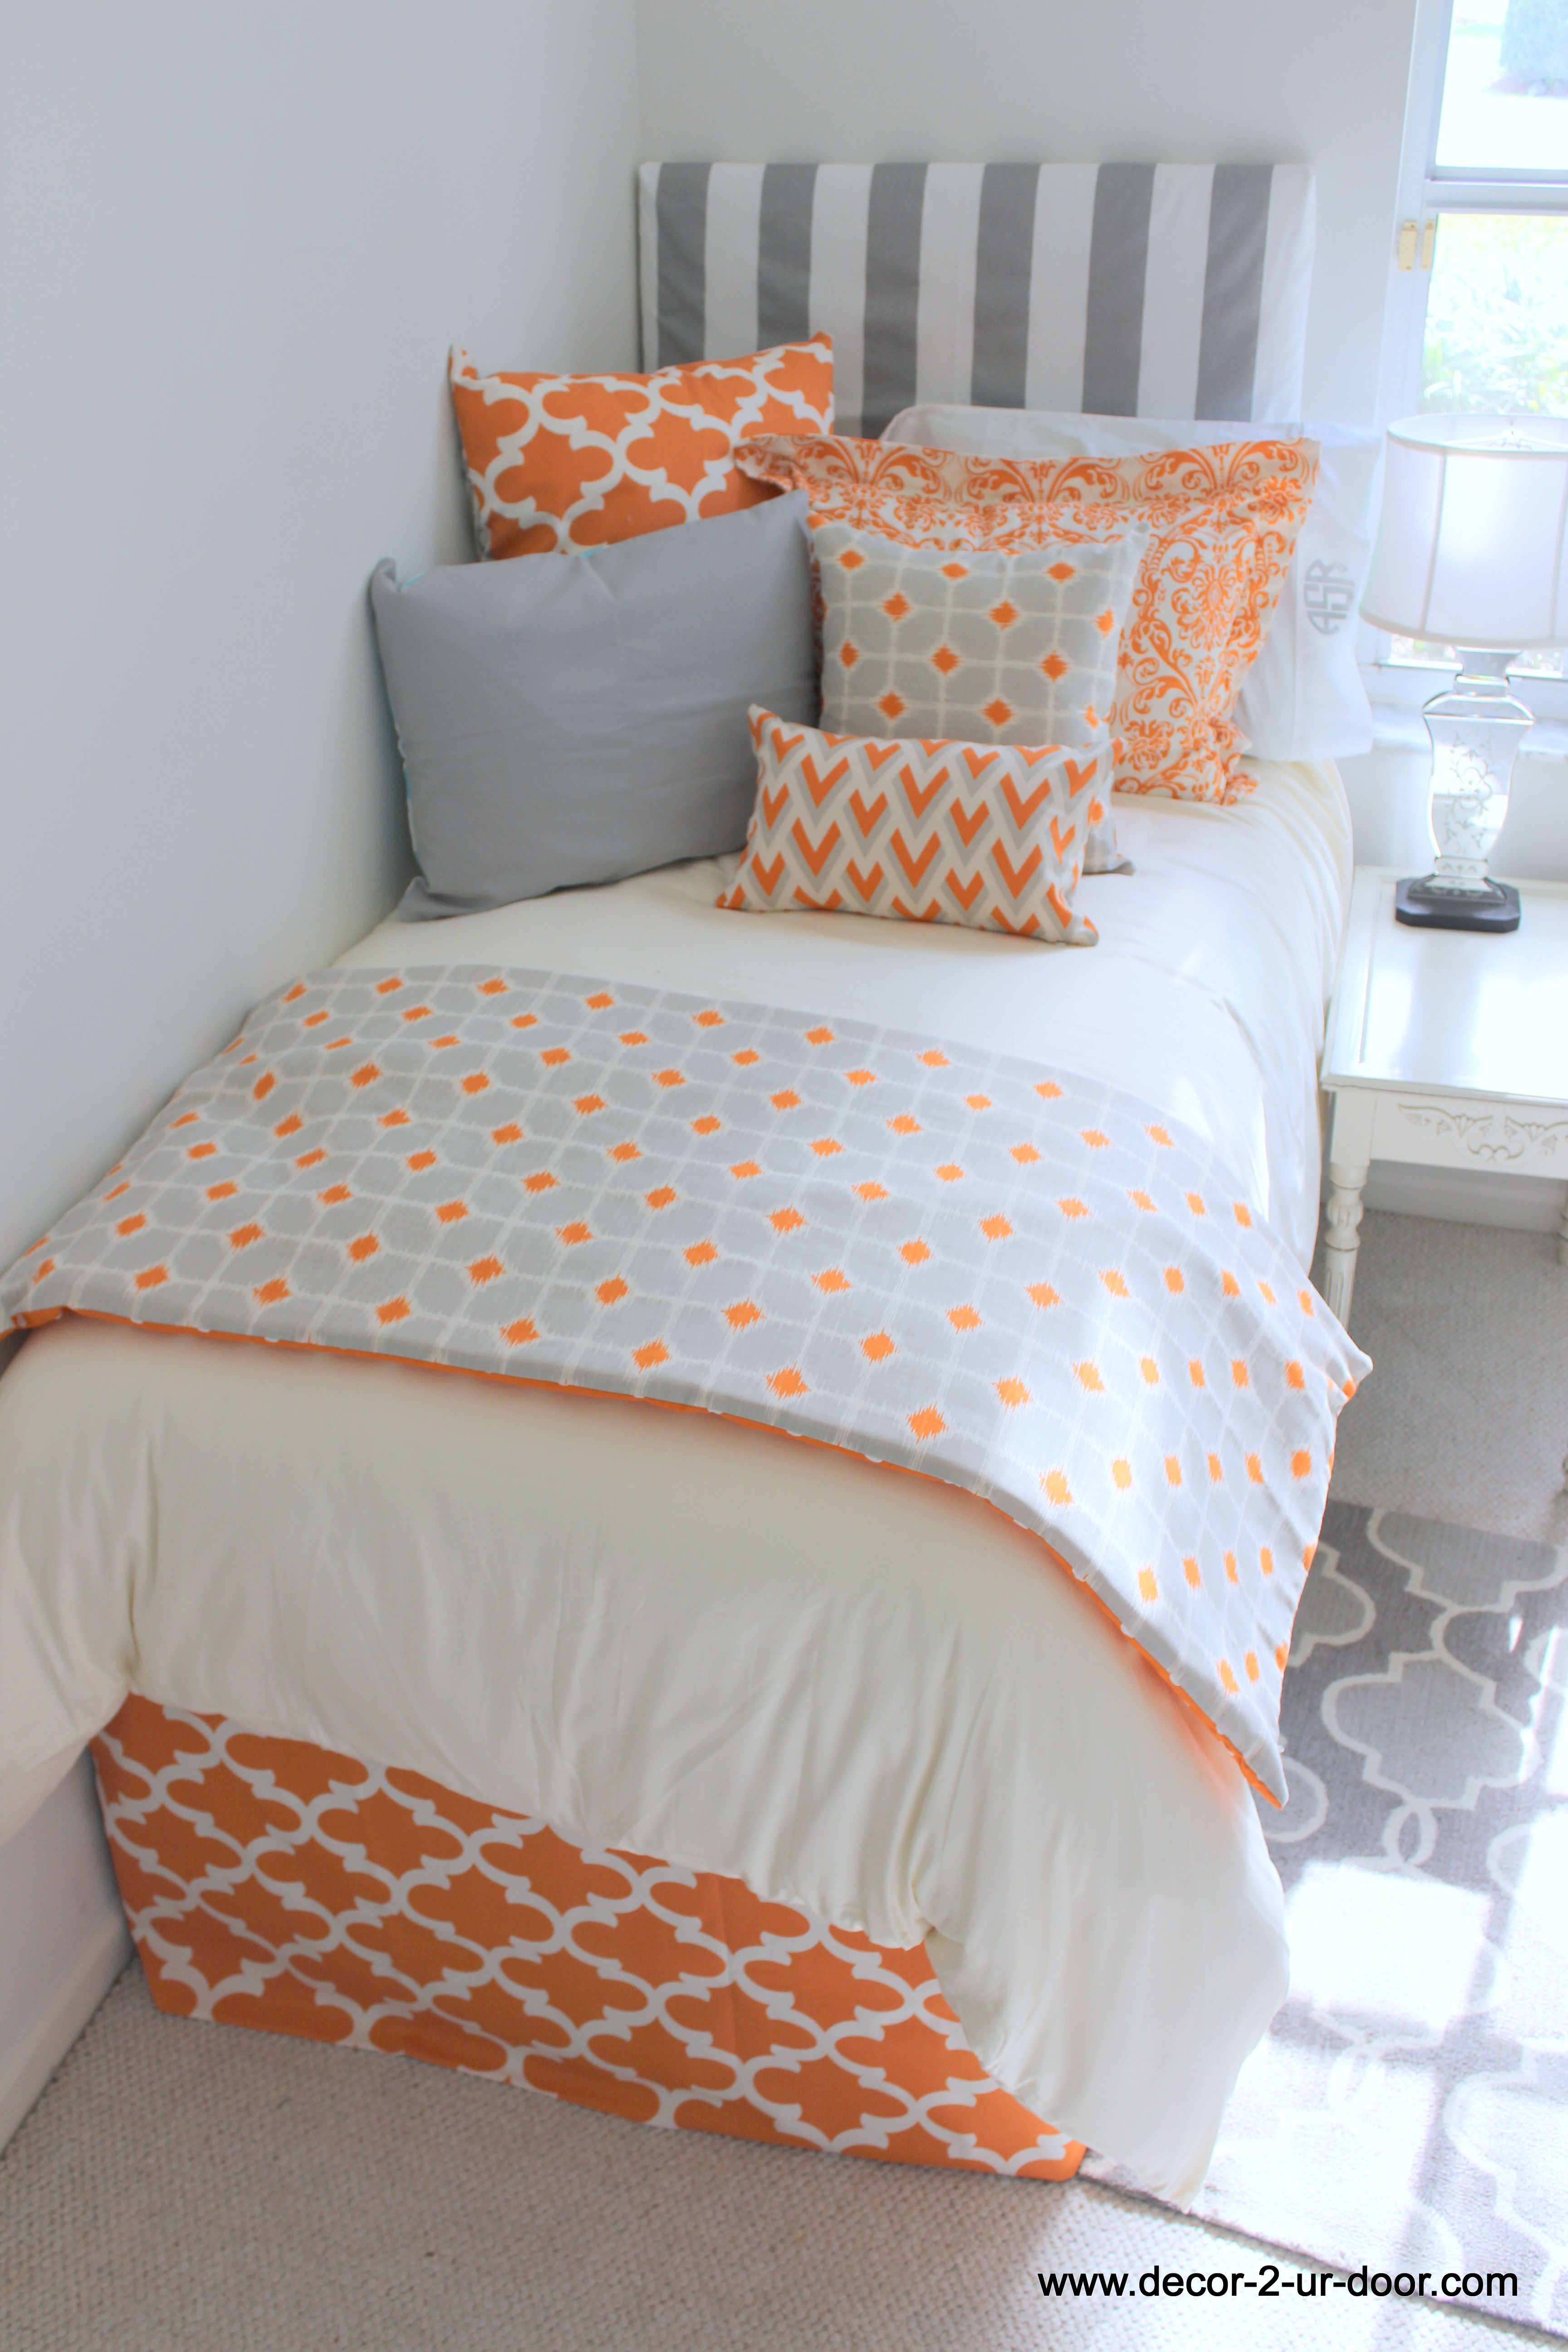 Tangerine and grey designer dorm room bedding new release love the - Best dorm room ideas ...